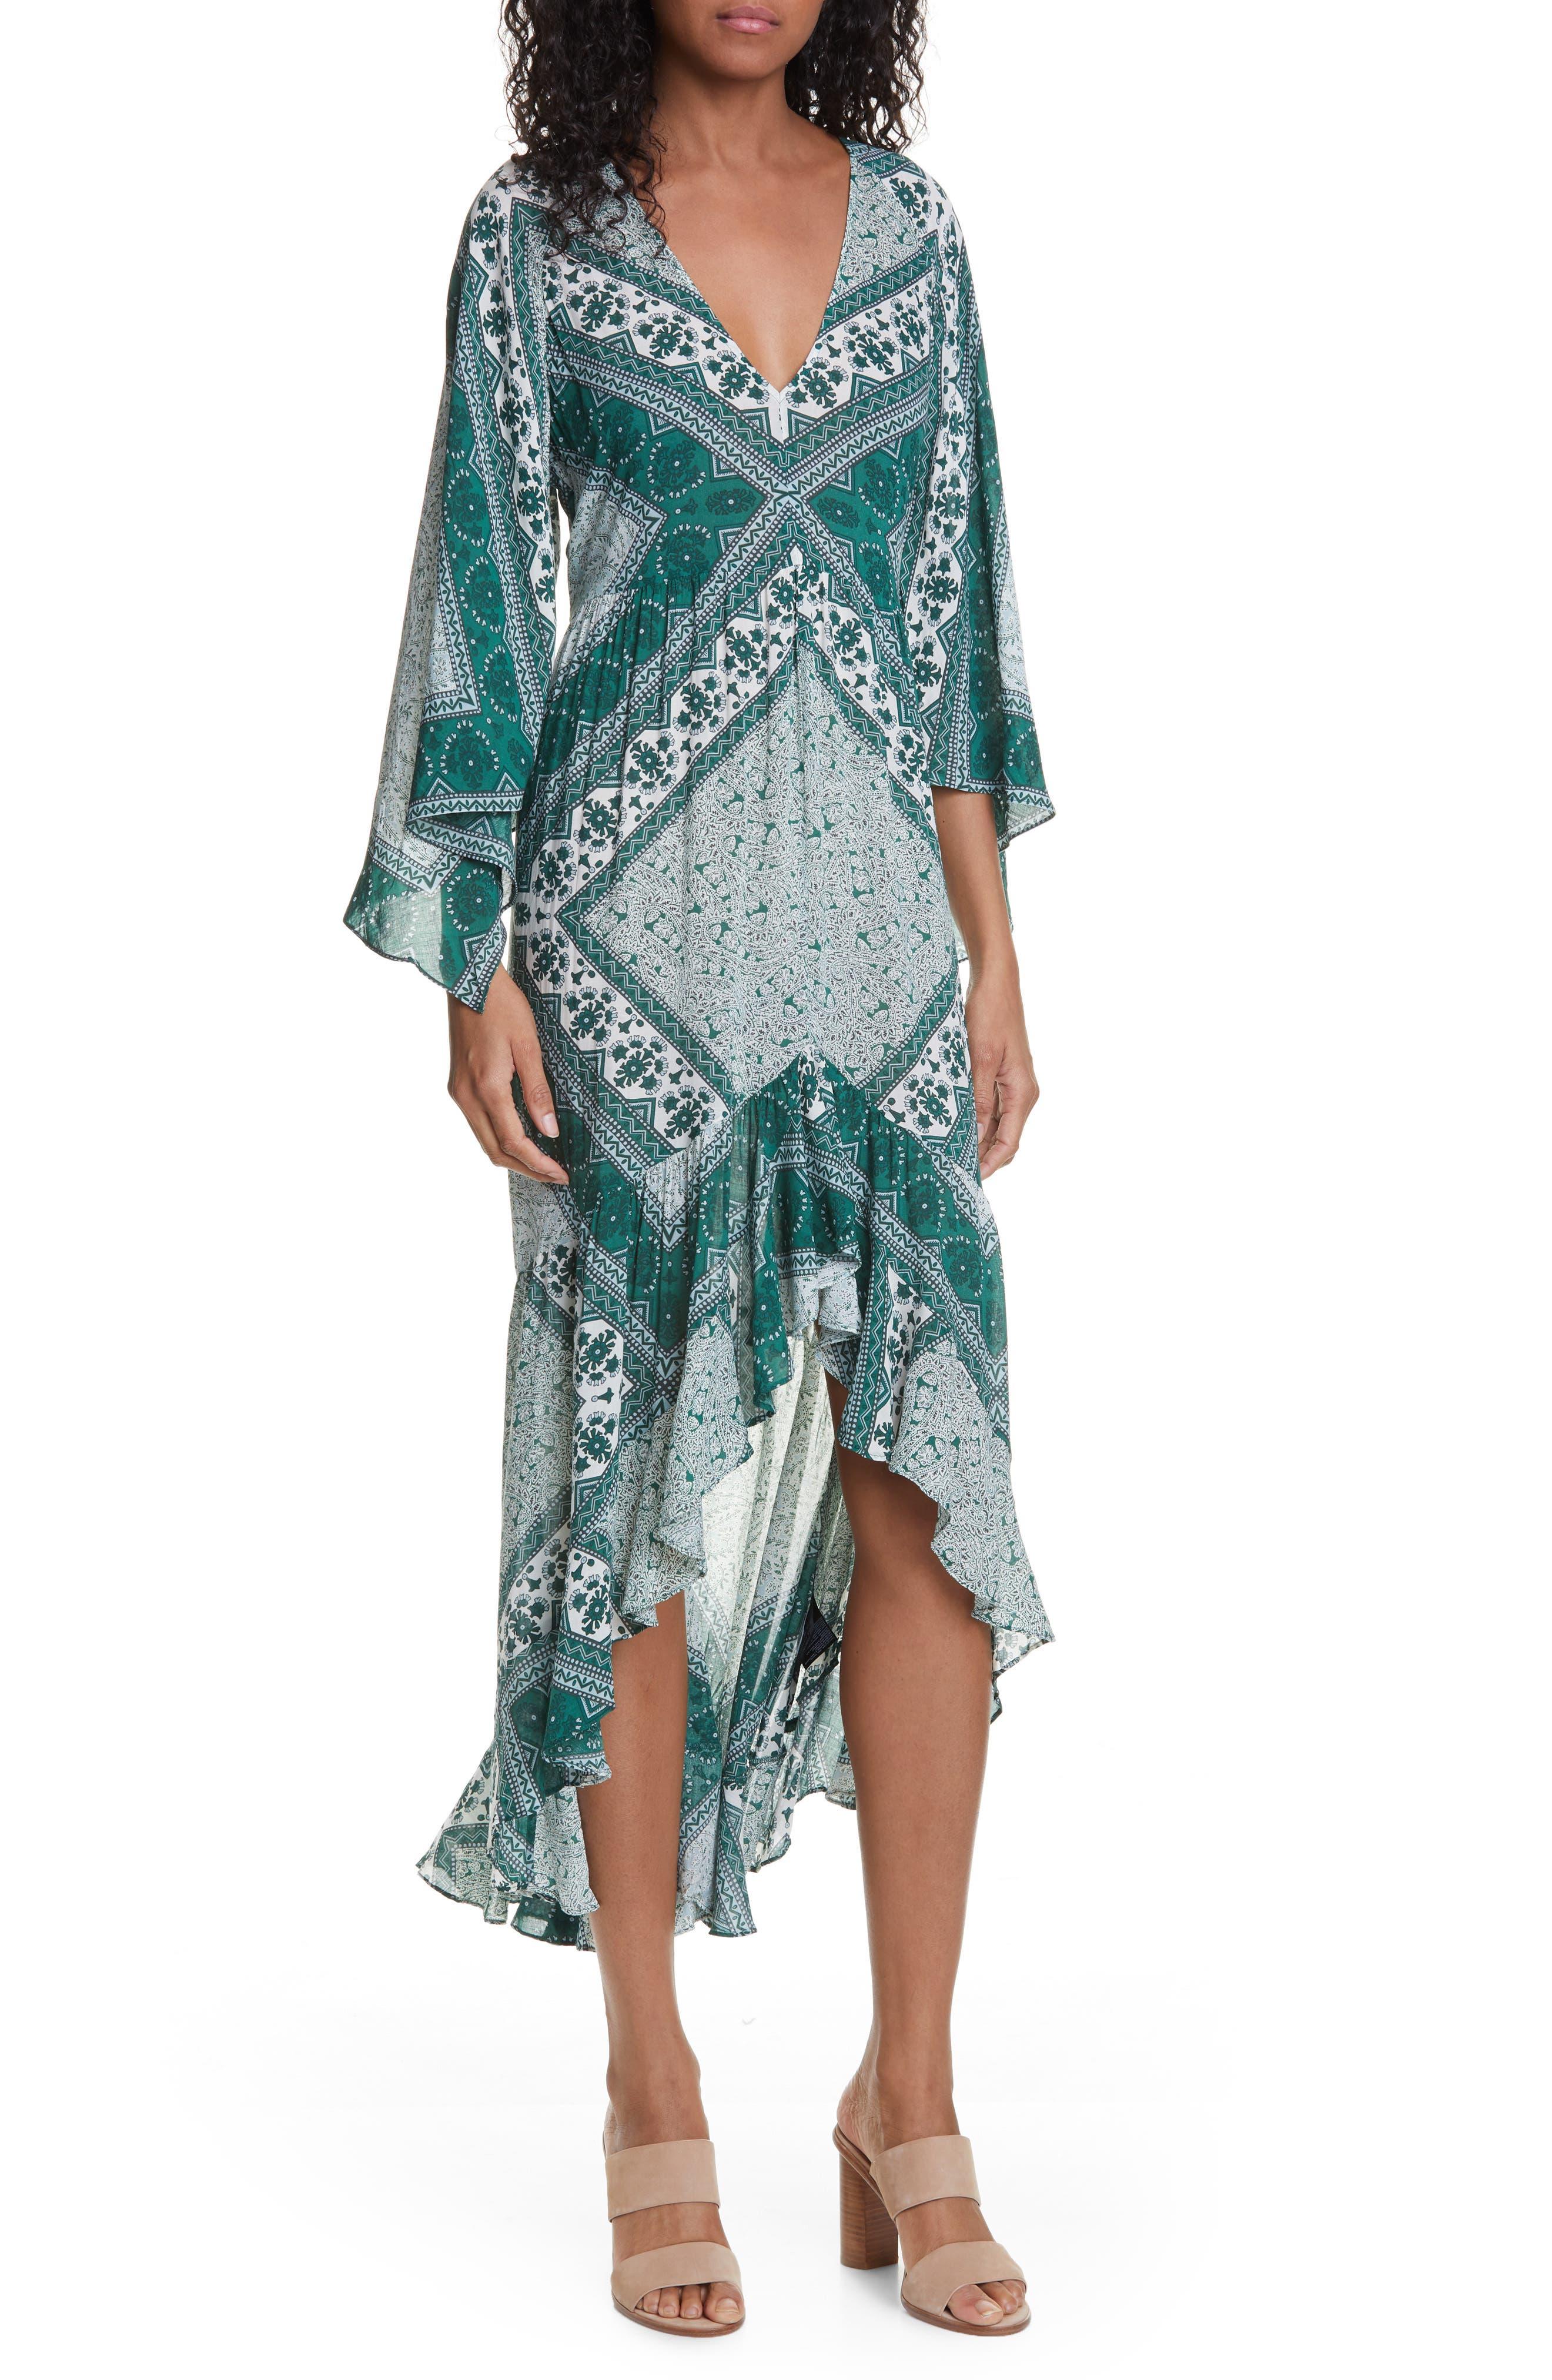 Ba & sh Usso Mixed Print High/low Dress, Green